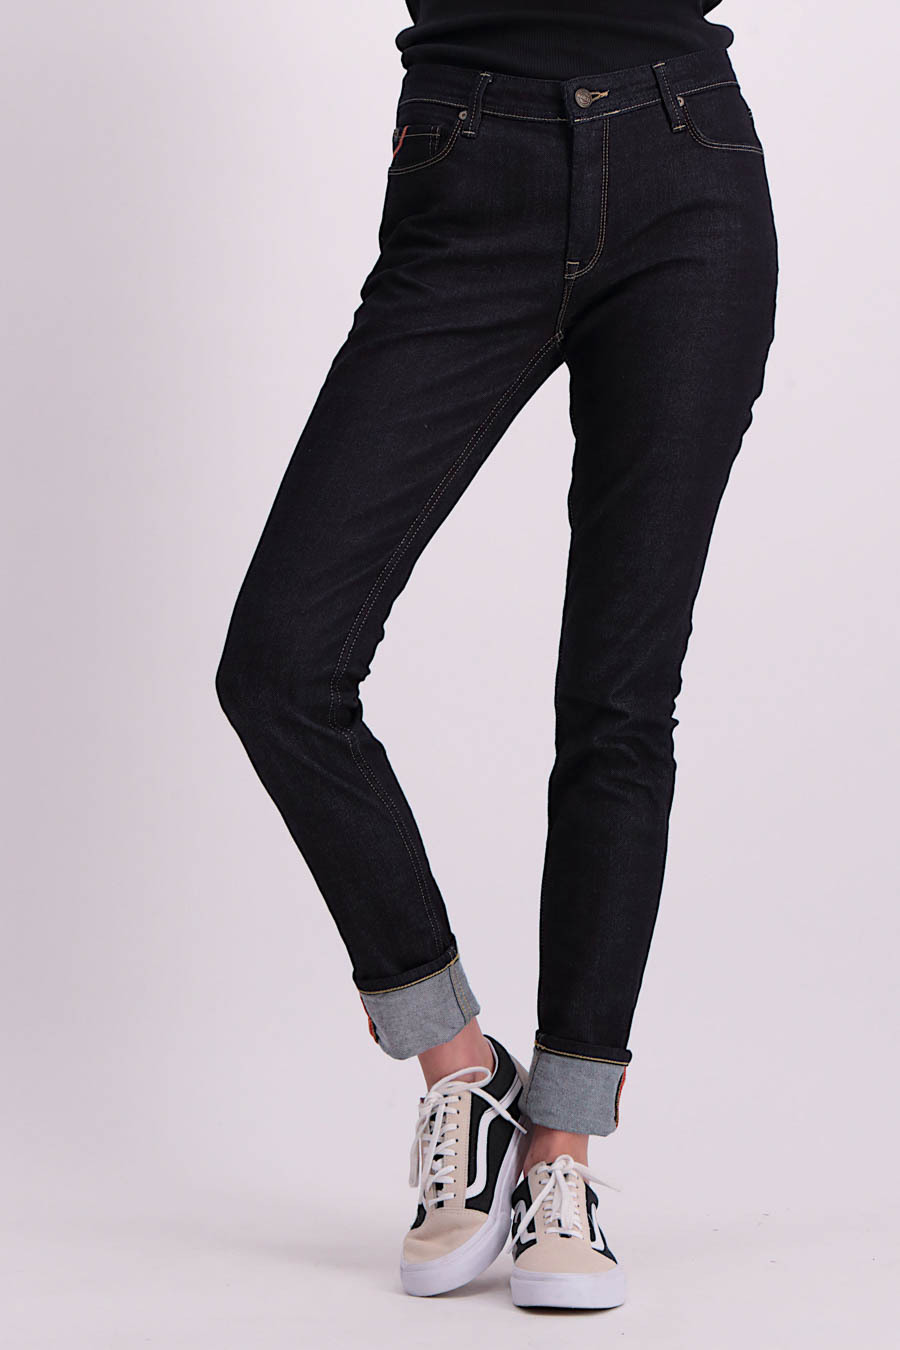 Lees Jeans For Women